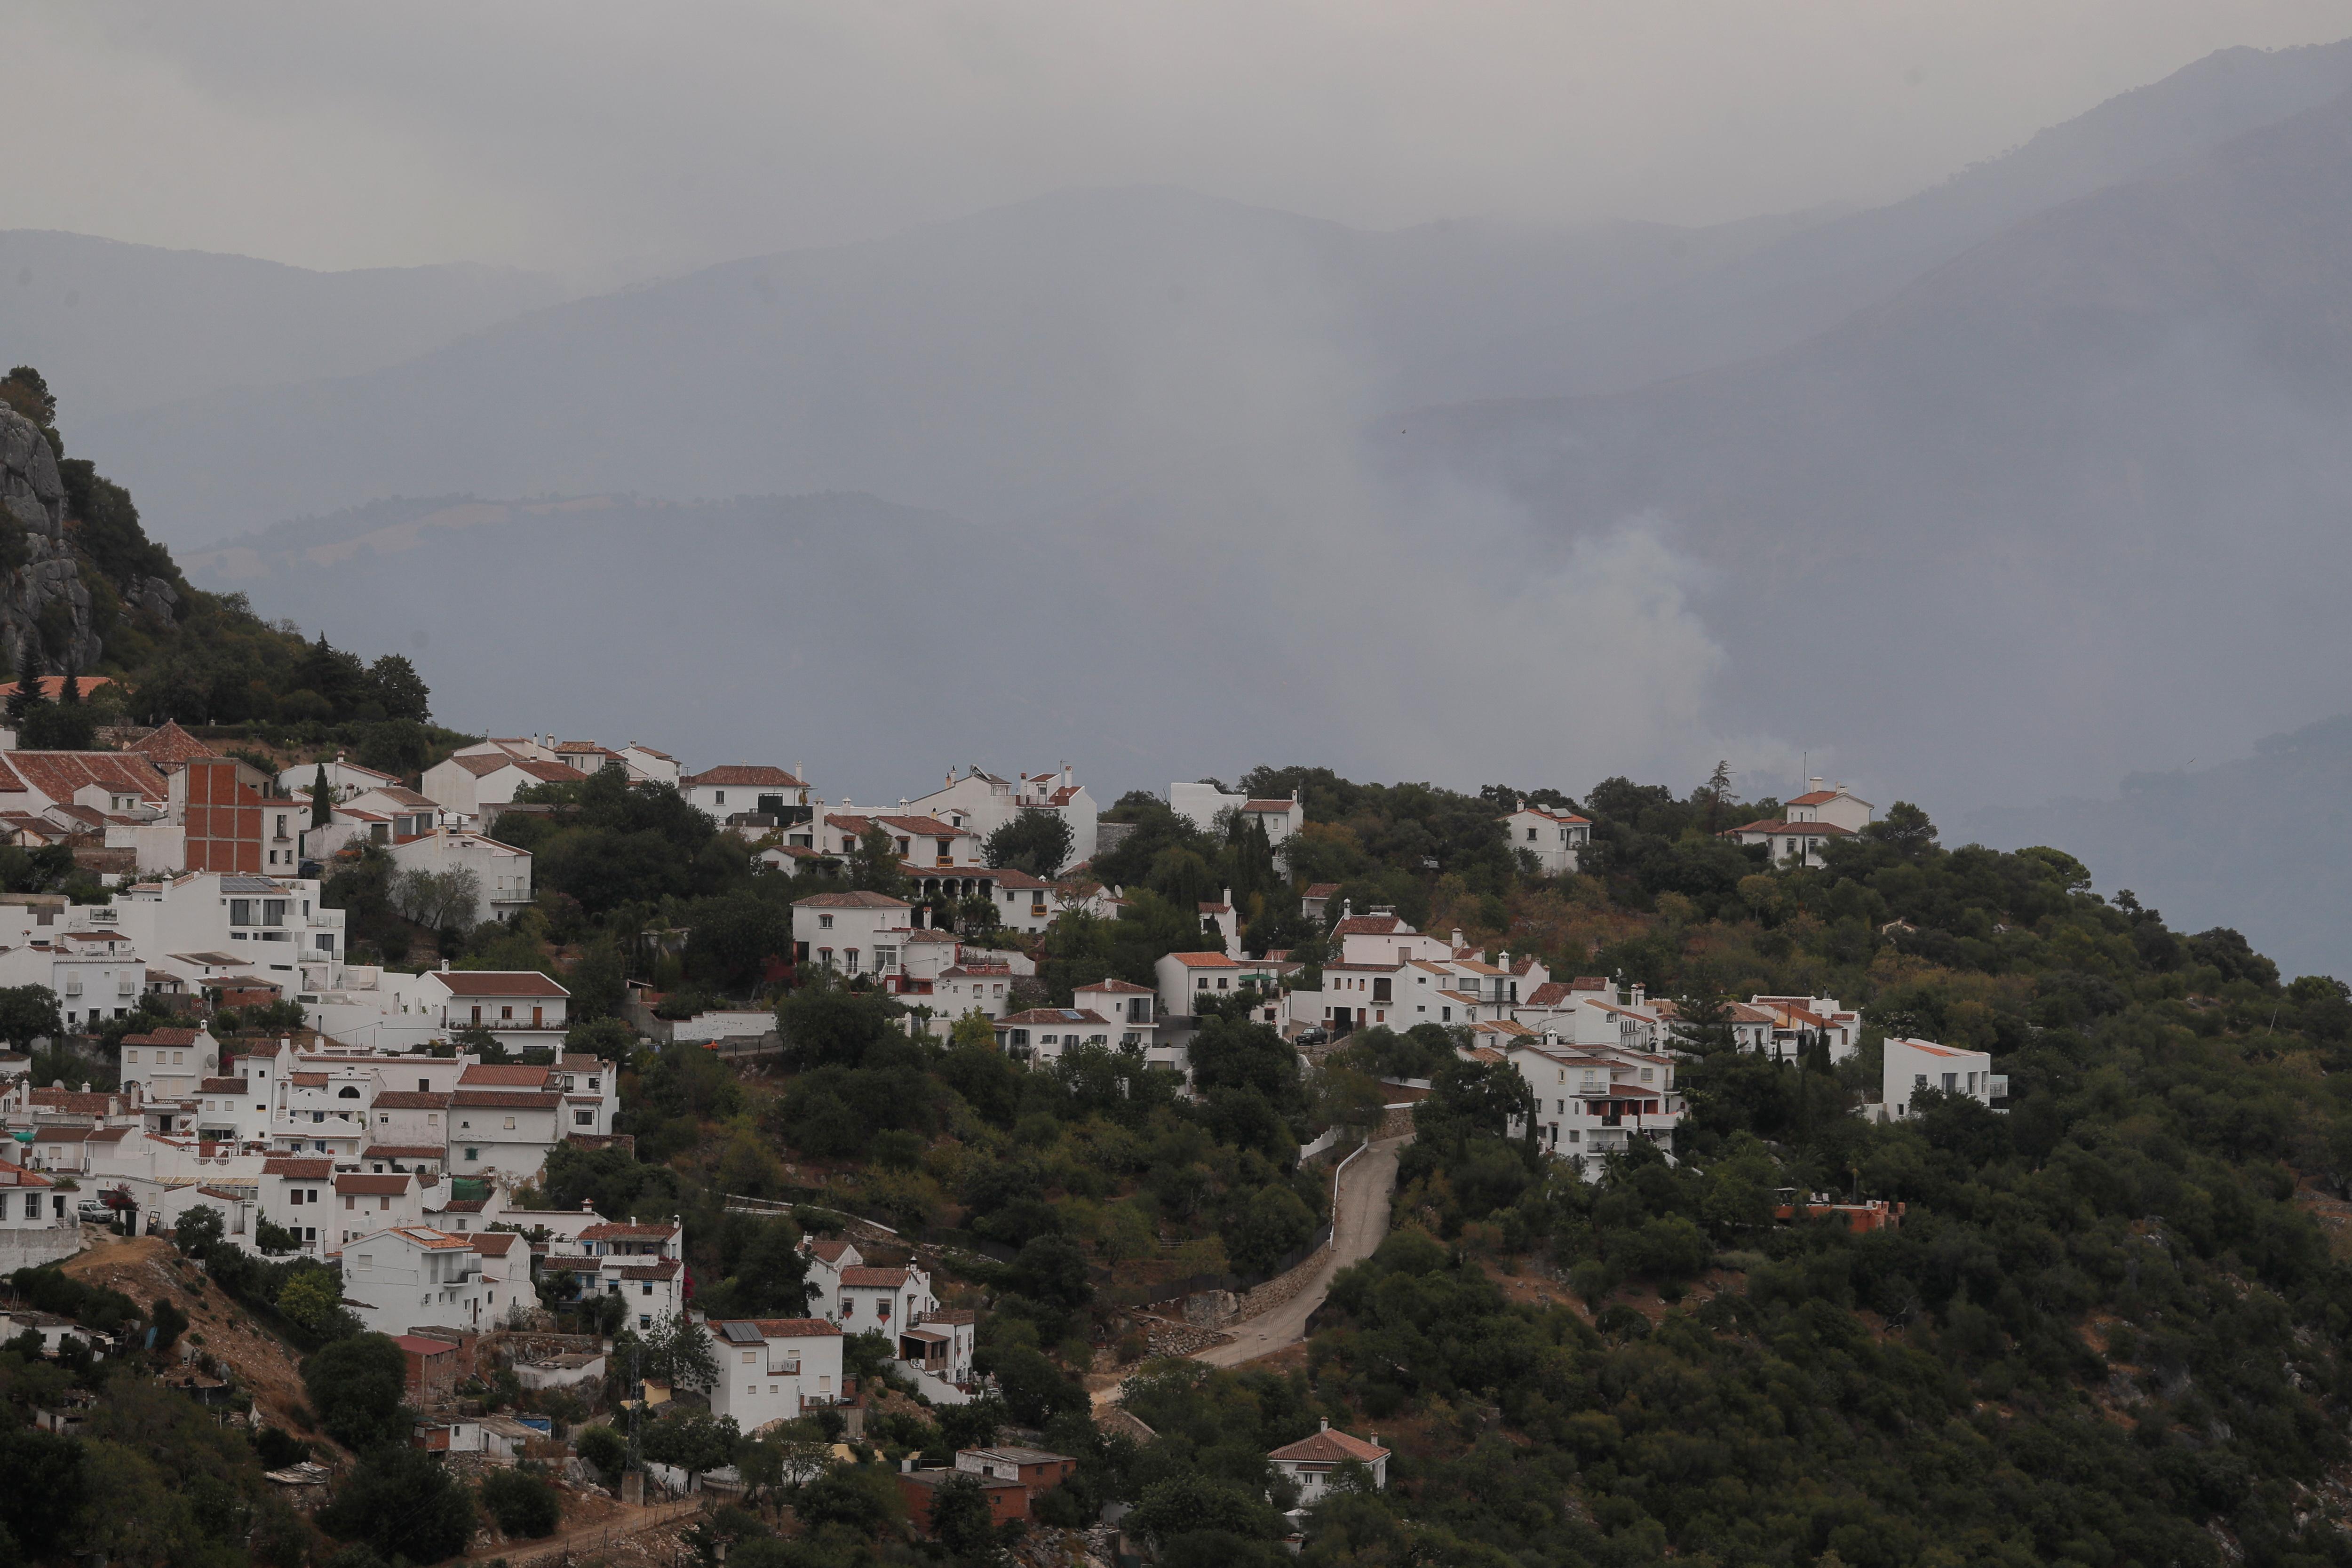 A wildfire is seen on Sierra Bermeja mountain from Gaucin, near Estepona, Spain, September 13, 2021. REUTERS/Jon Nazca